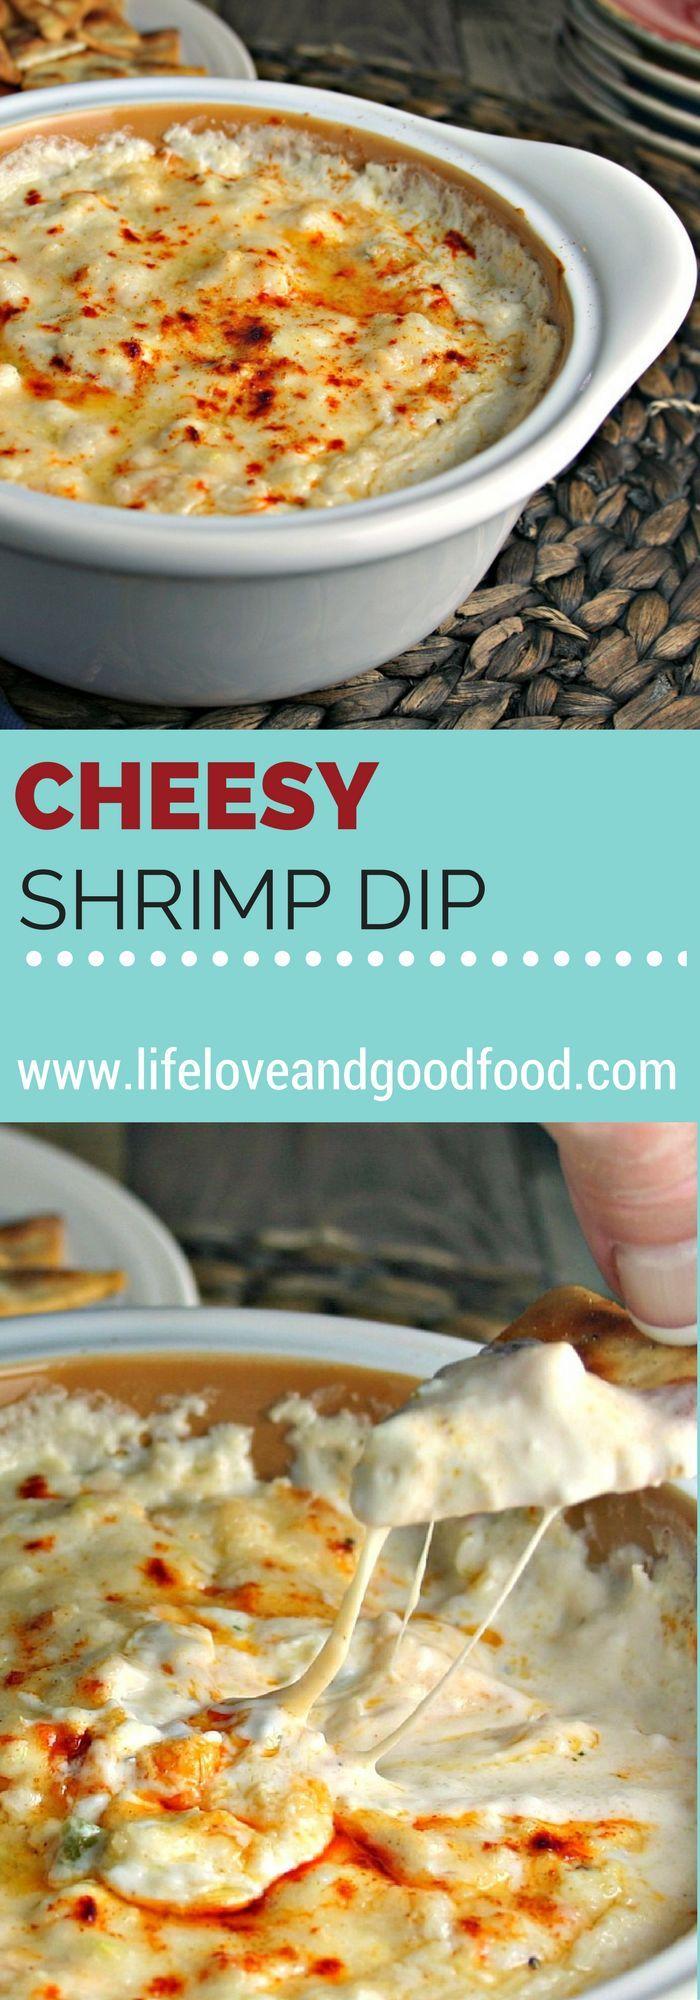 Cheesy Shrimp Dip | Life, Love, and Good Food